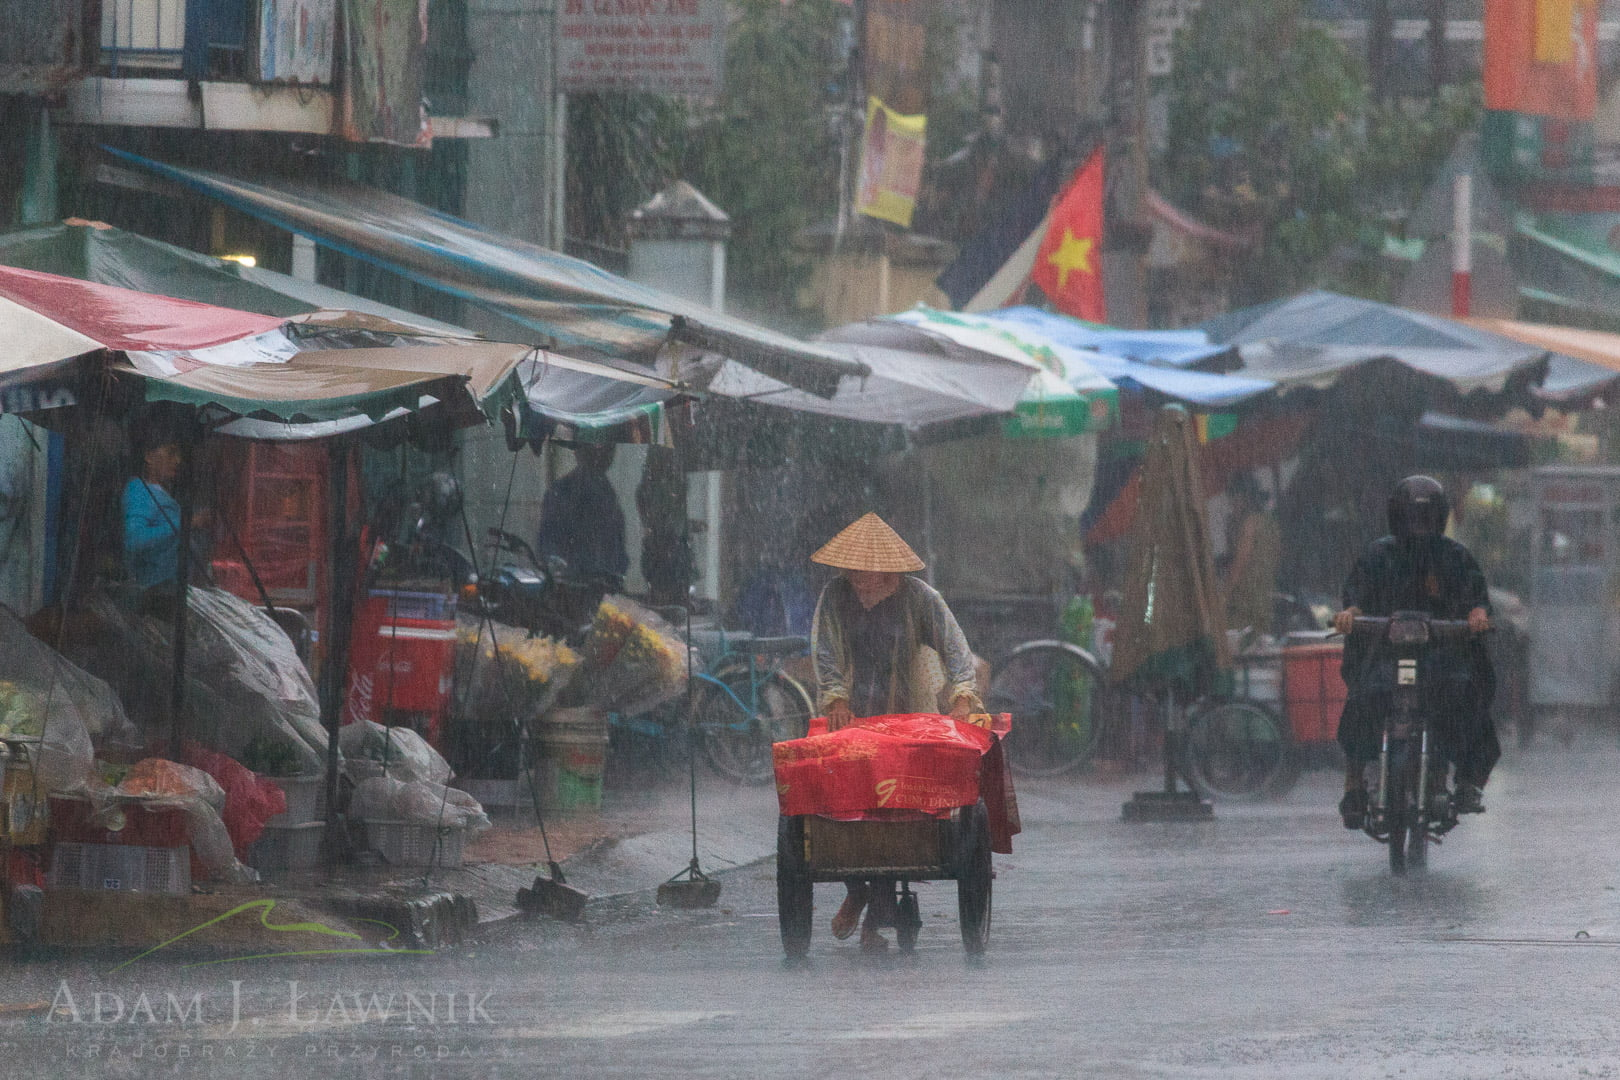 Vietnam 0909-01039C